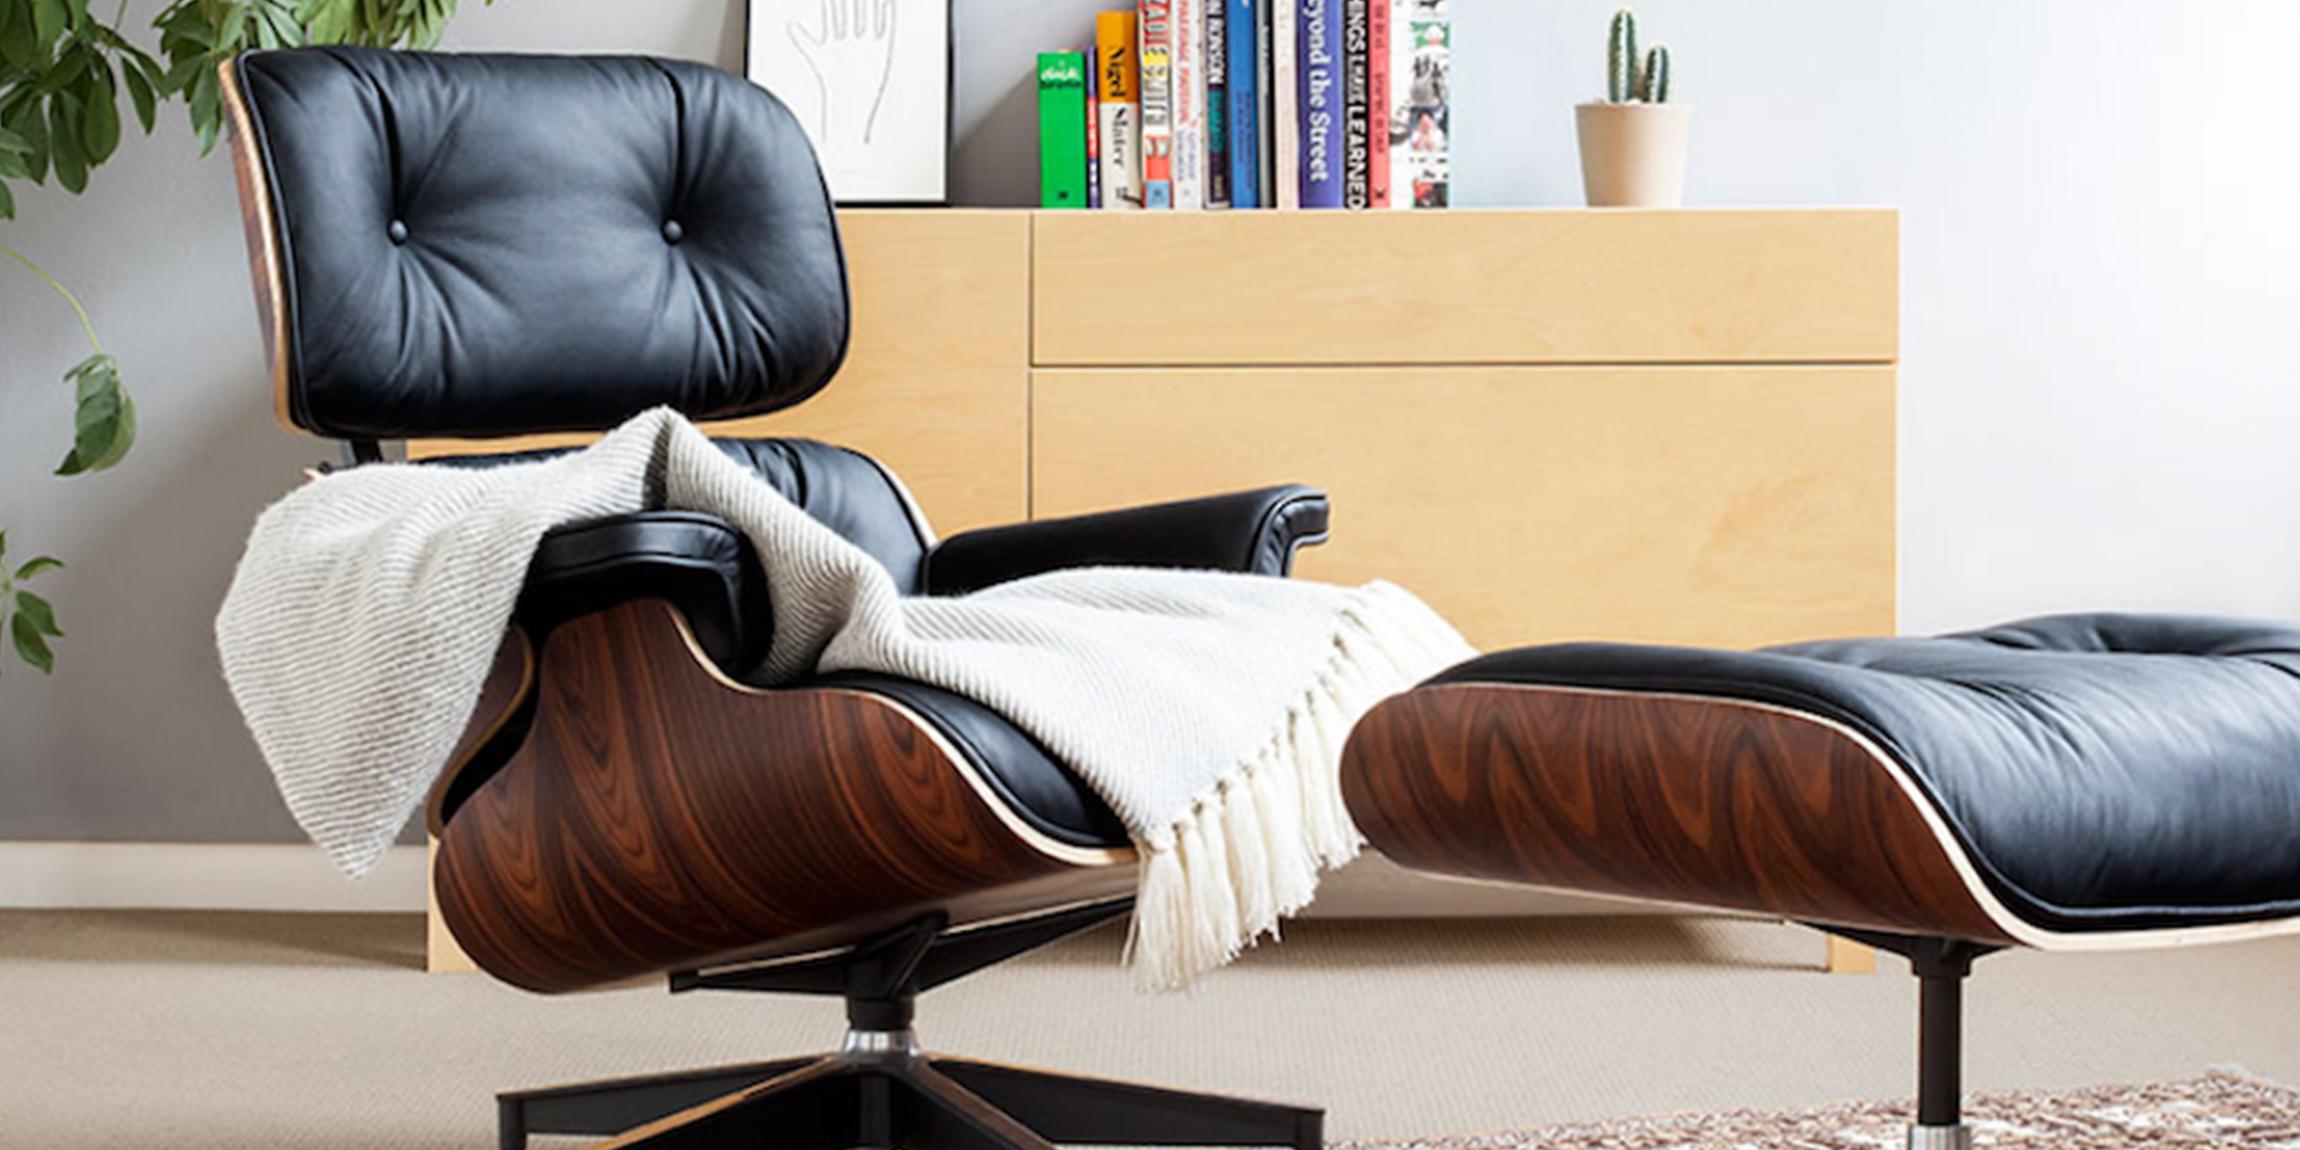 Pash Classics Eames Lounge Chair Replica